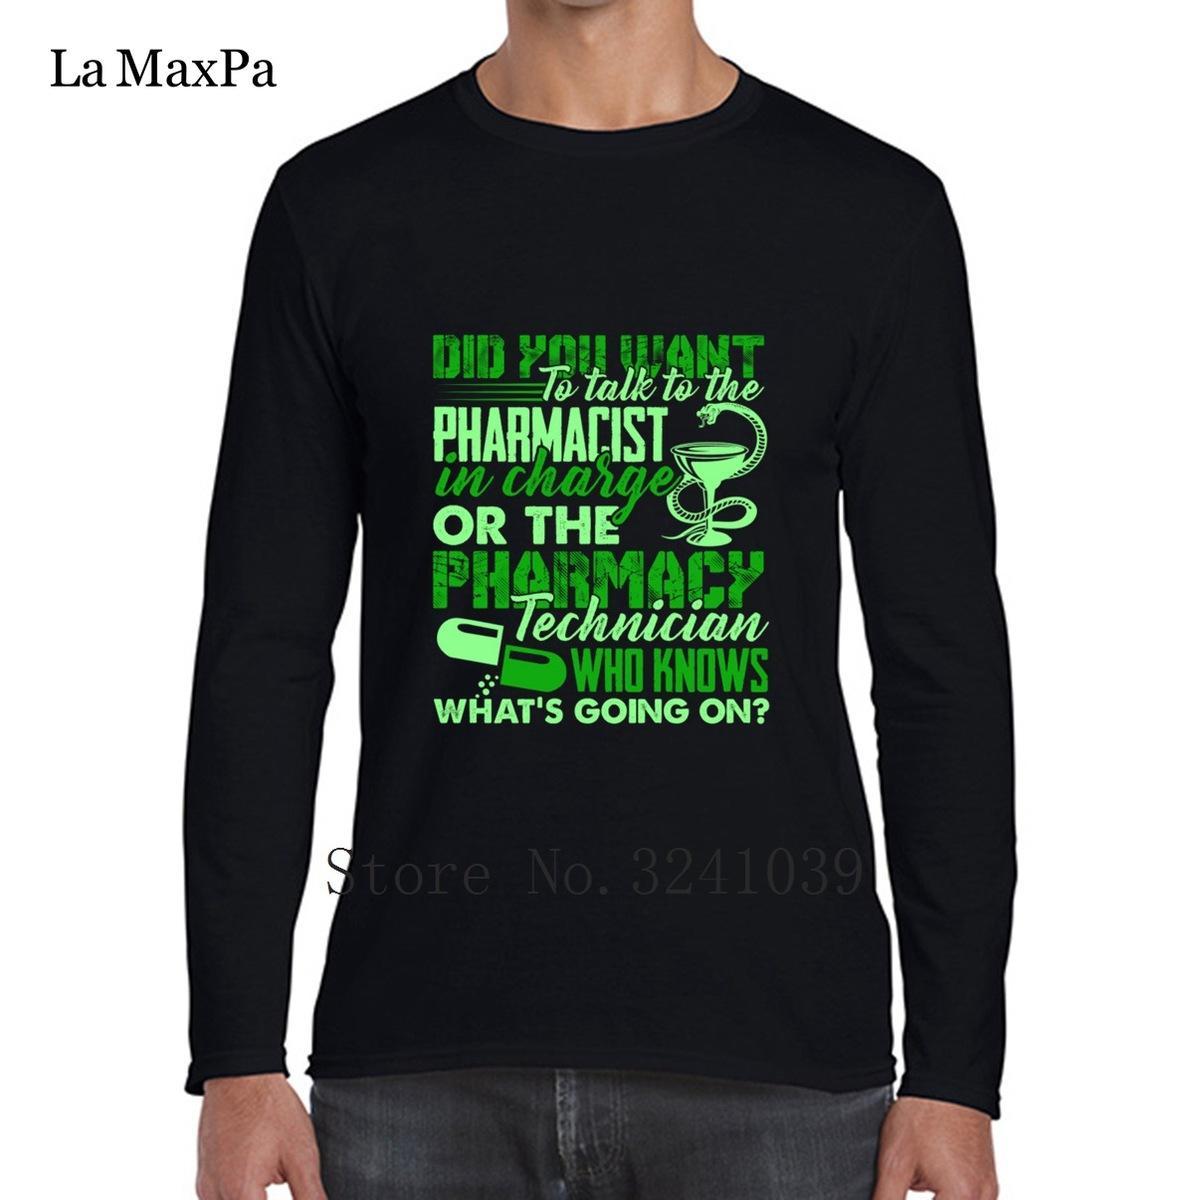 5b167e57 Printedized Latest Letter Pharmacy Technician T Shirt Men's Tee Shirt  Branded winter Men's T-Shirt Adult O-Neck Tshirt Pop Top